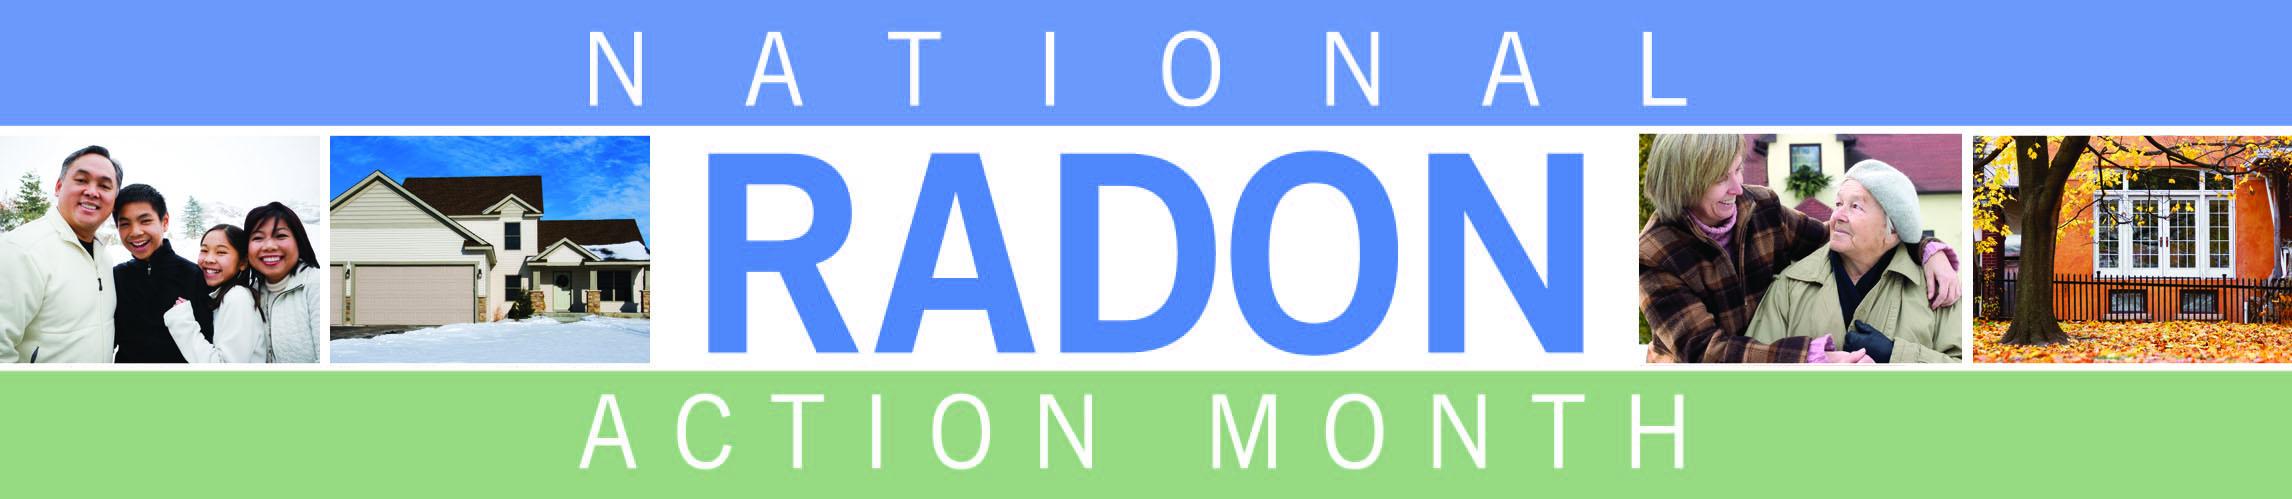 National Radon Action Month